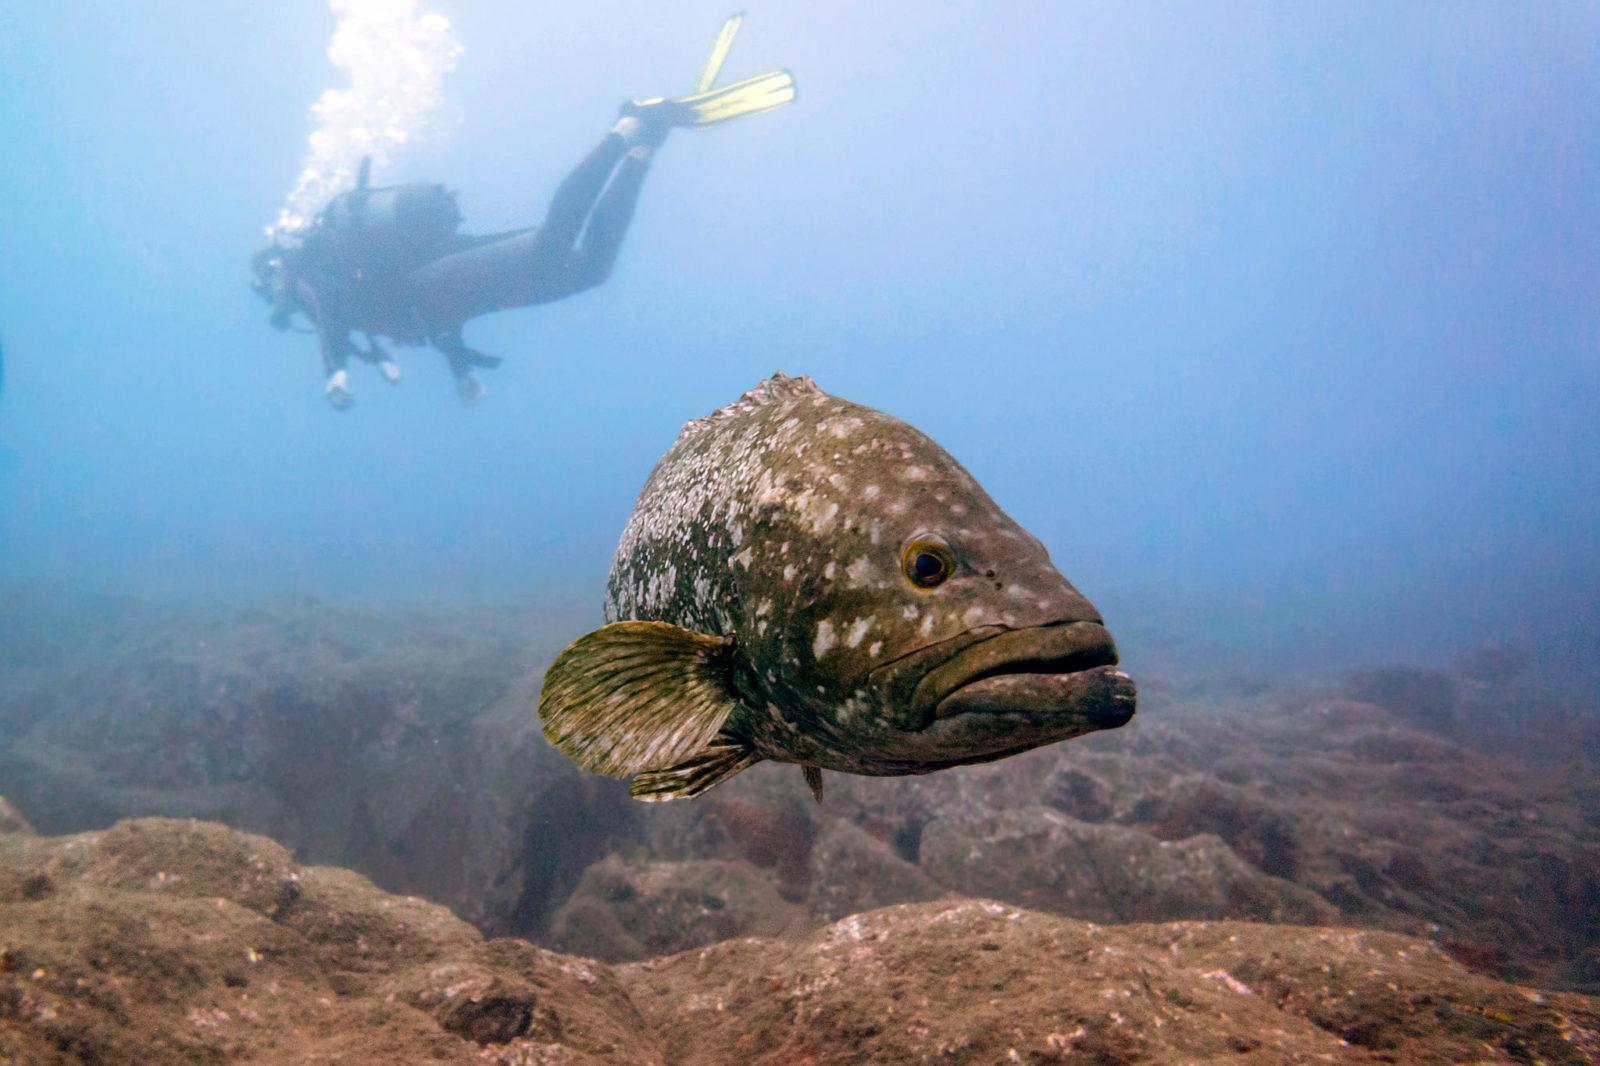 Групер (лат. Epinephelus) – род рыб из семейства каменных окуней (фото: Malcolm Browne)